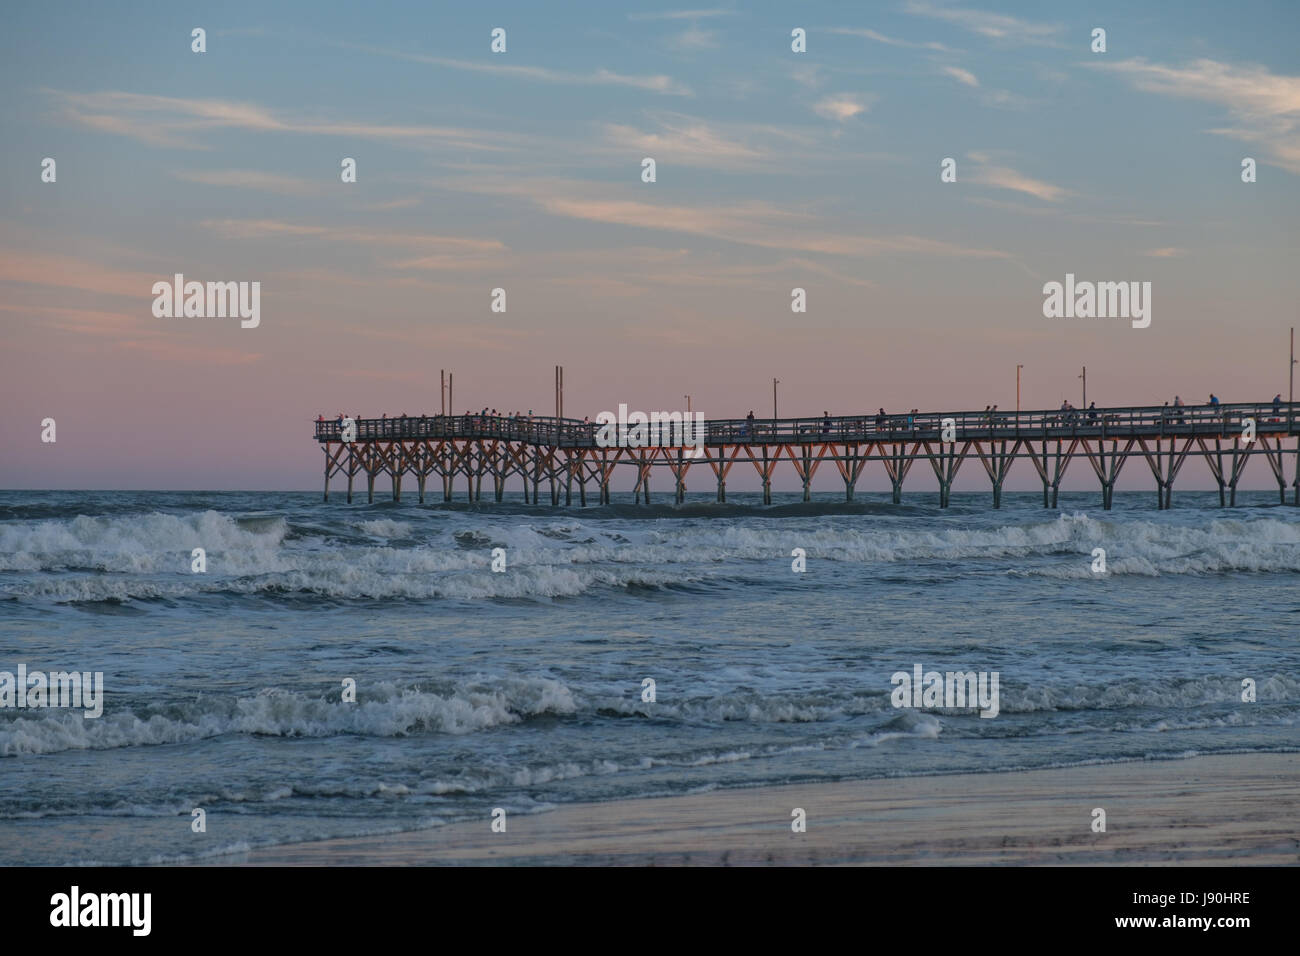 Sunset Beach Fishing Pier at Sunset - Stock Image